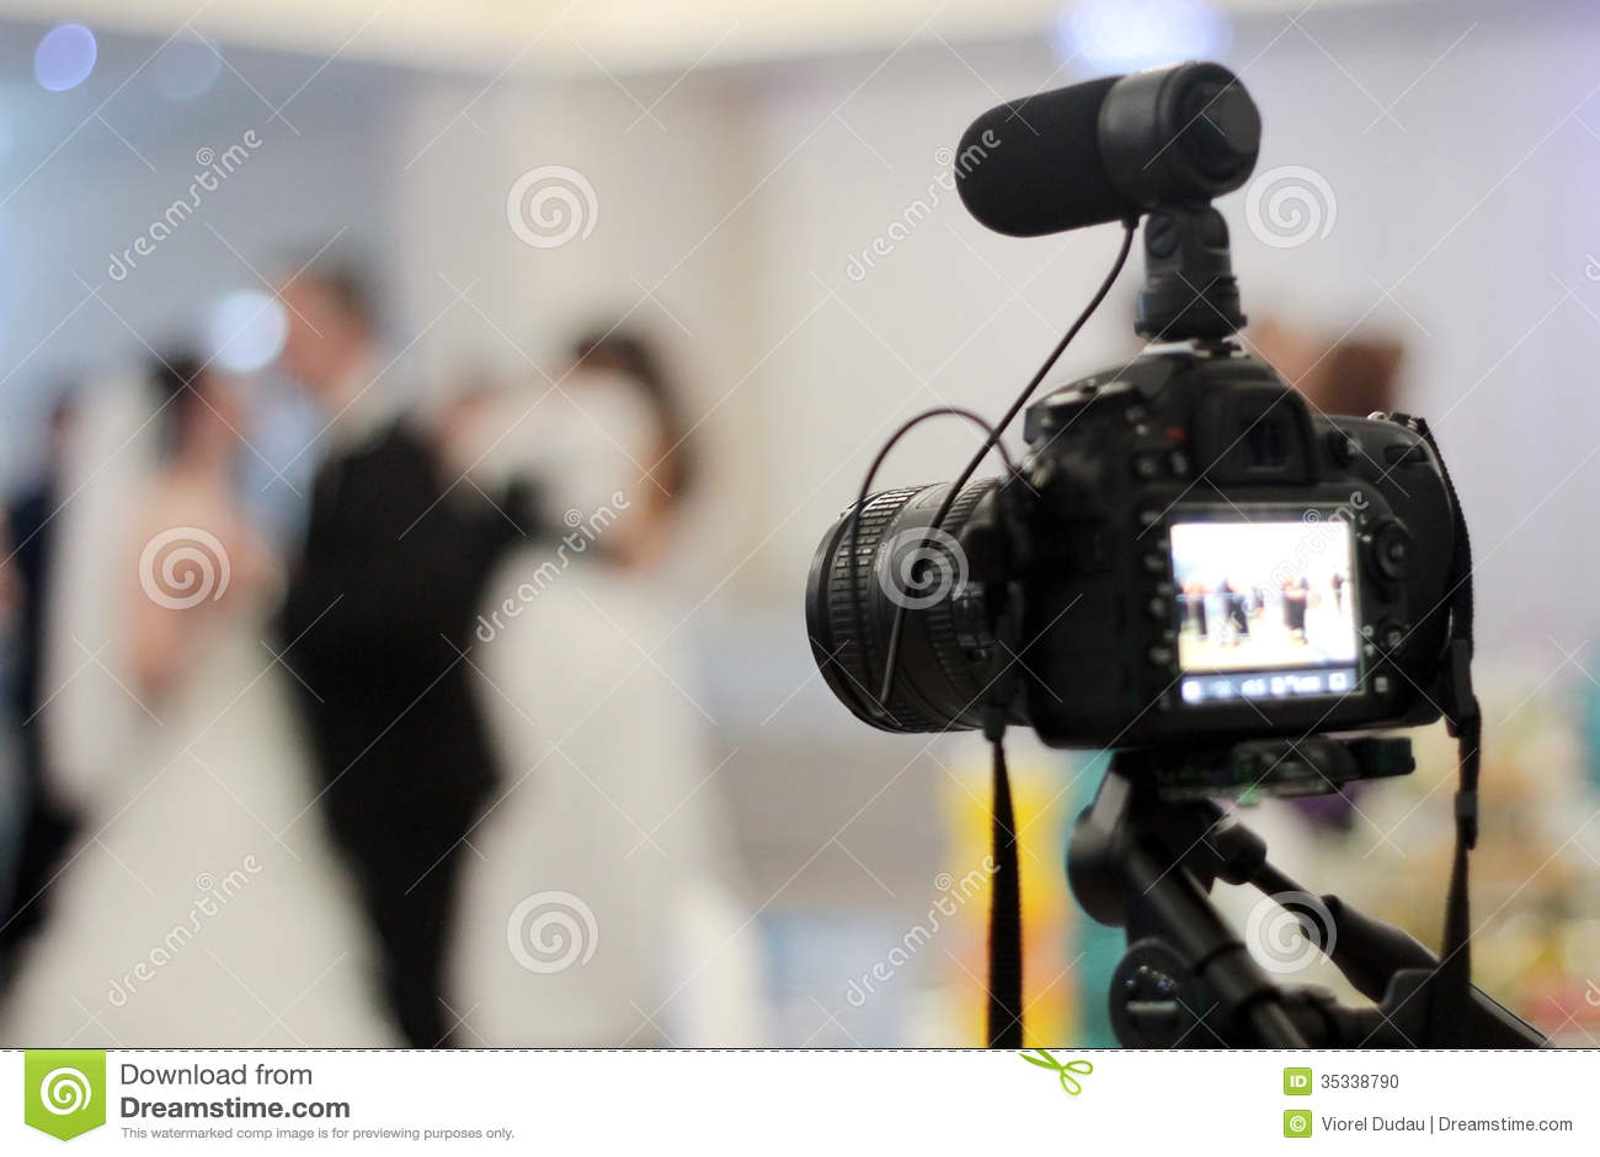 Camera Dslr Camera For Video Recording wedding videography stock photo image 35338790 videography